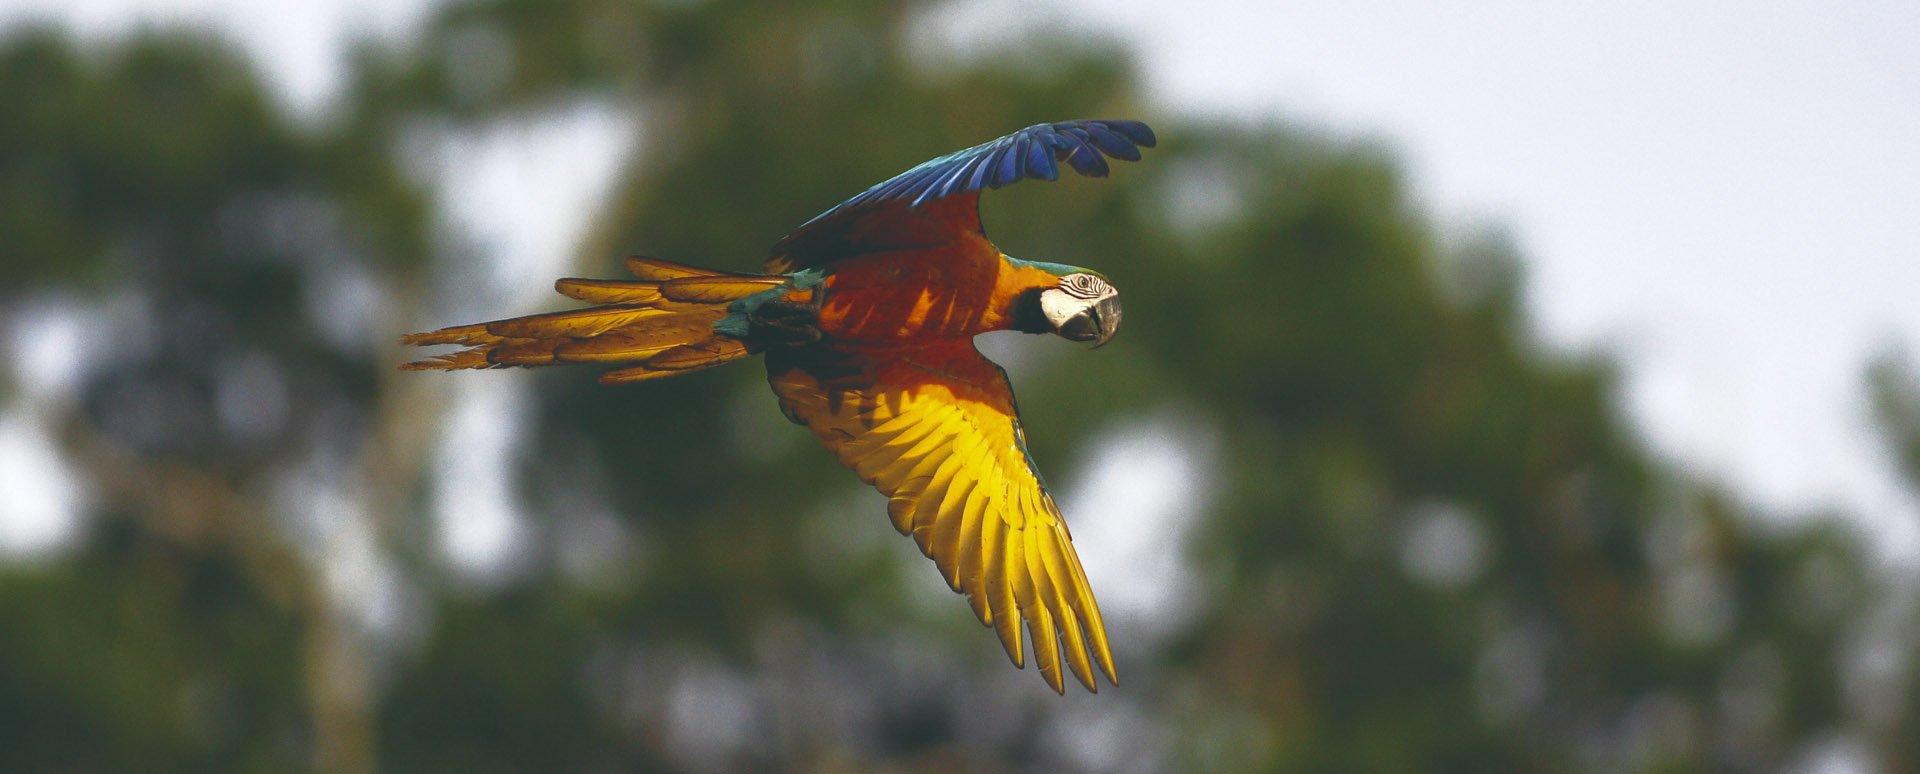 Reserva Amazonica bird